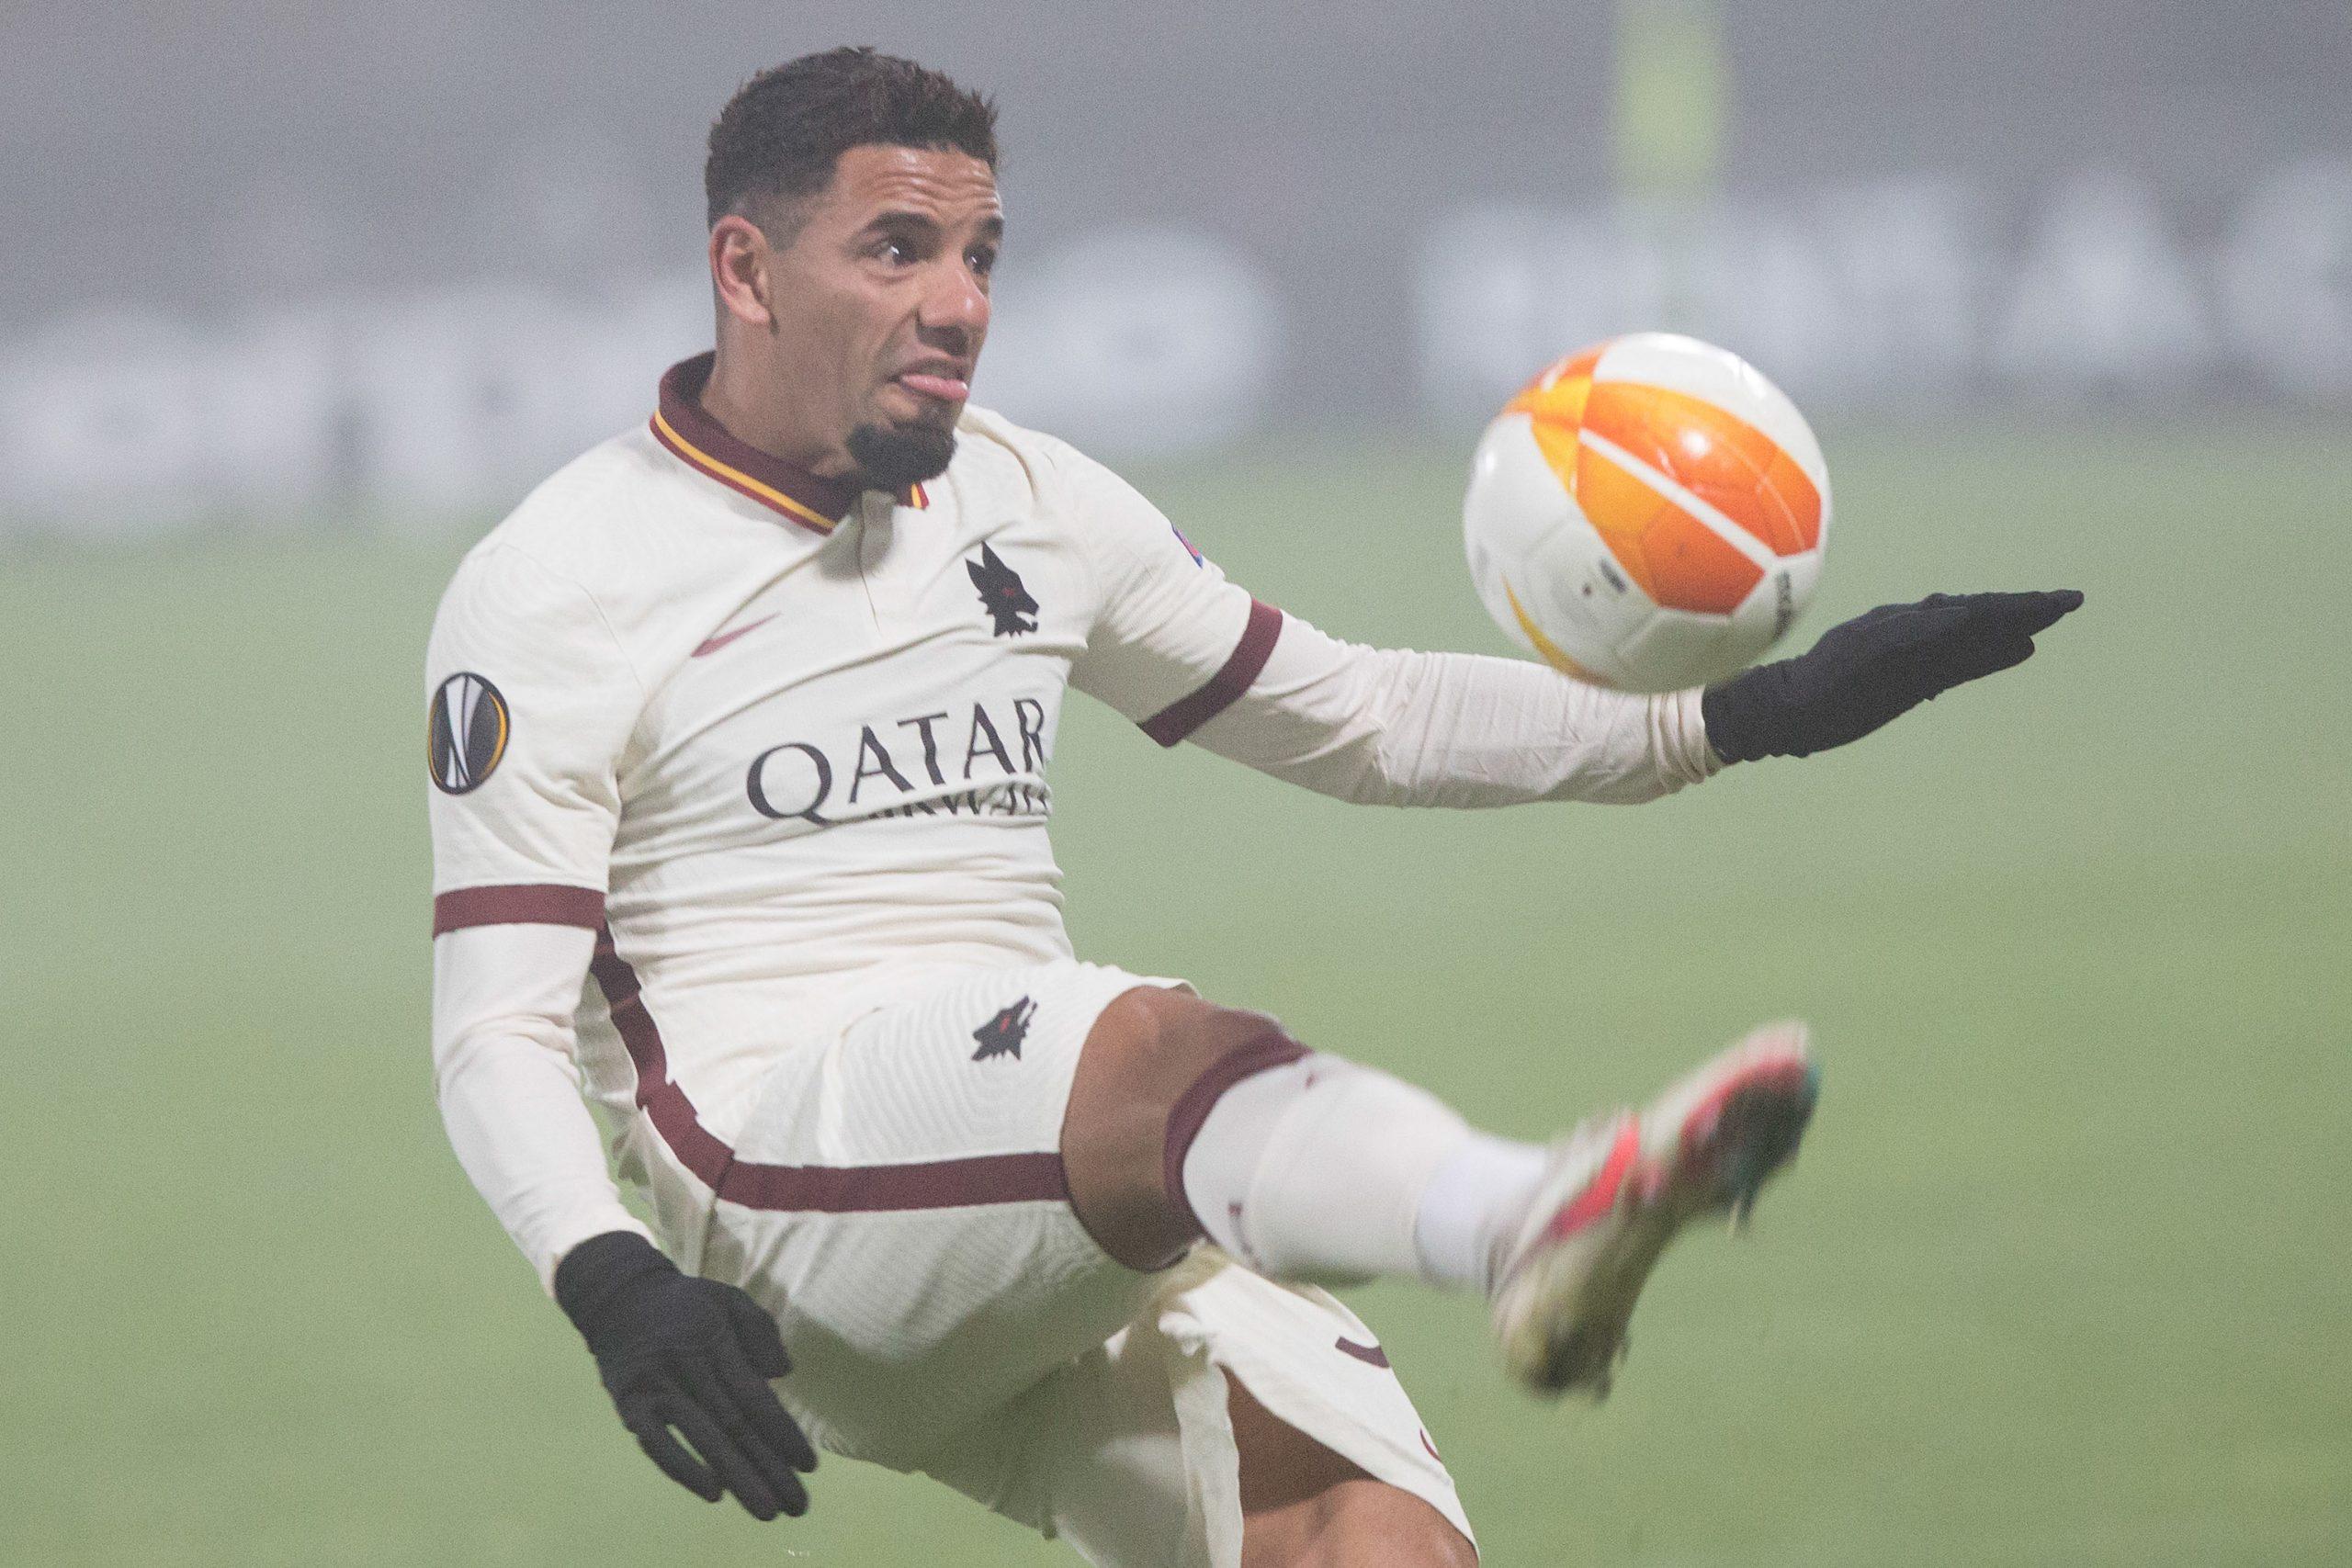 CFR Cluj - AS Roma Europa League minge fotbal INQUAM Manases Sandor